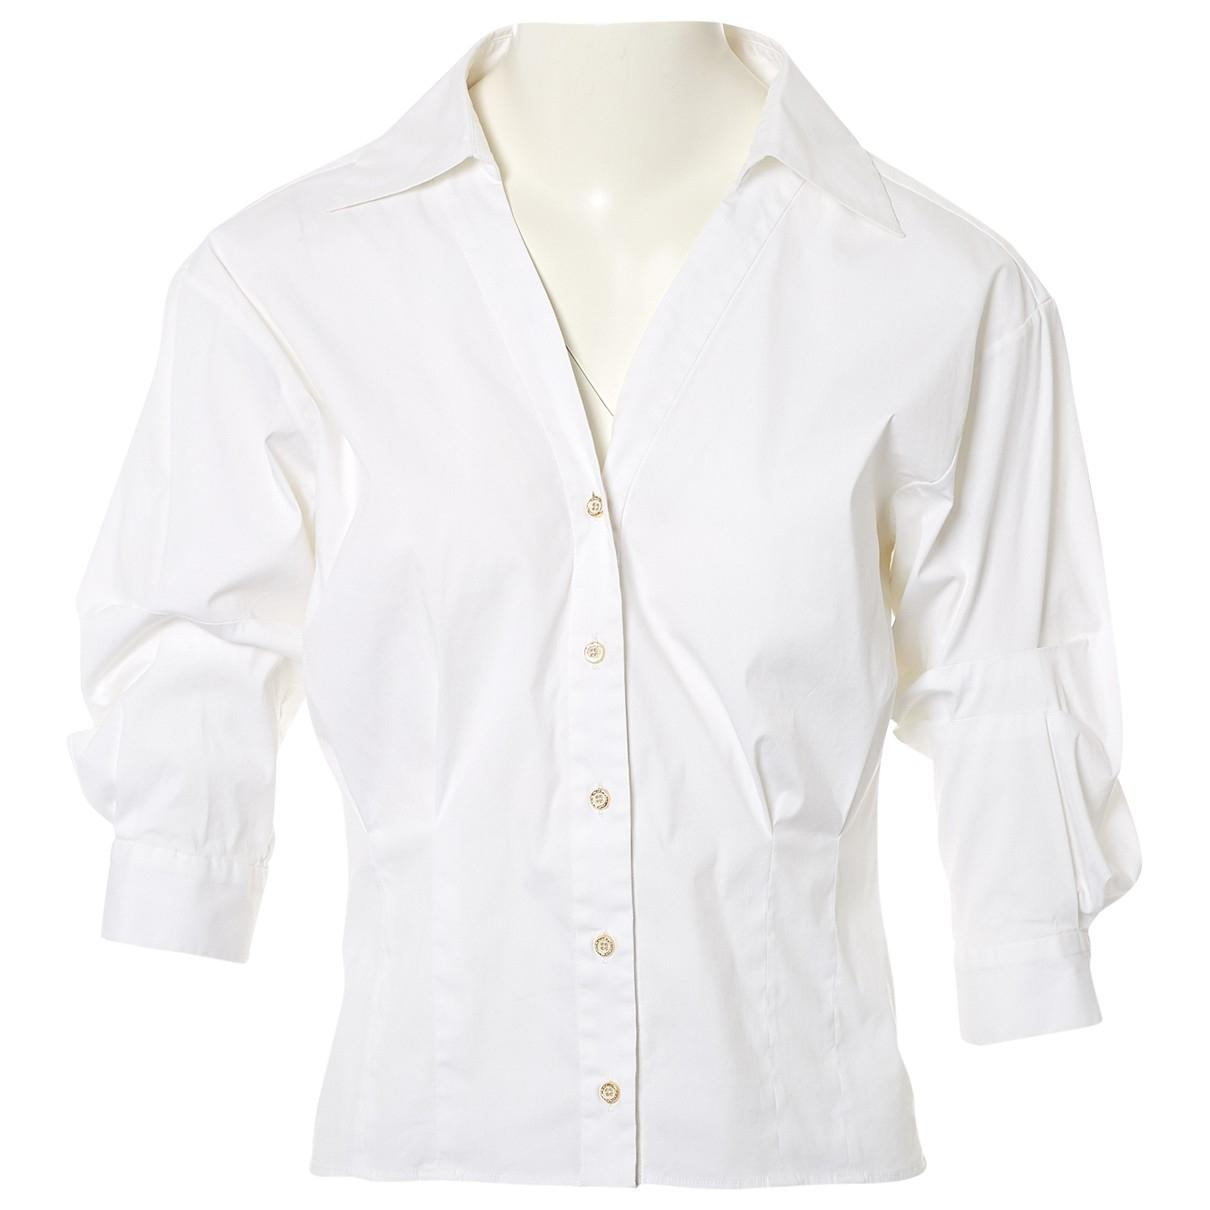 40325c93043b6a Oscar de la Renta Shirt in White - Lyst